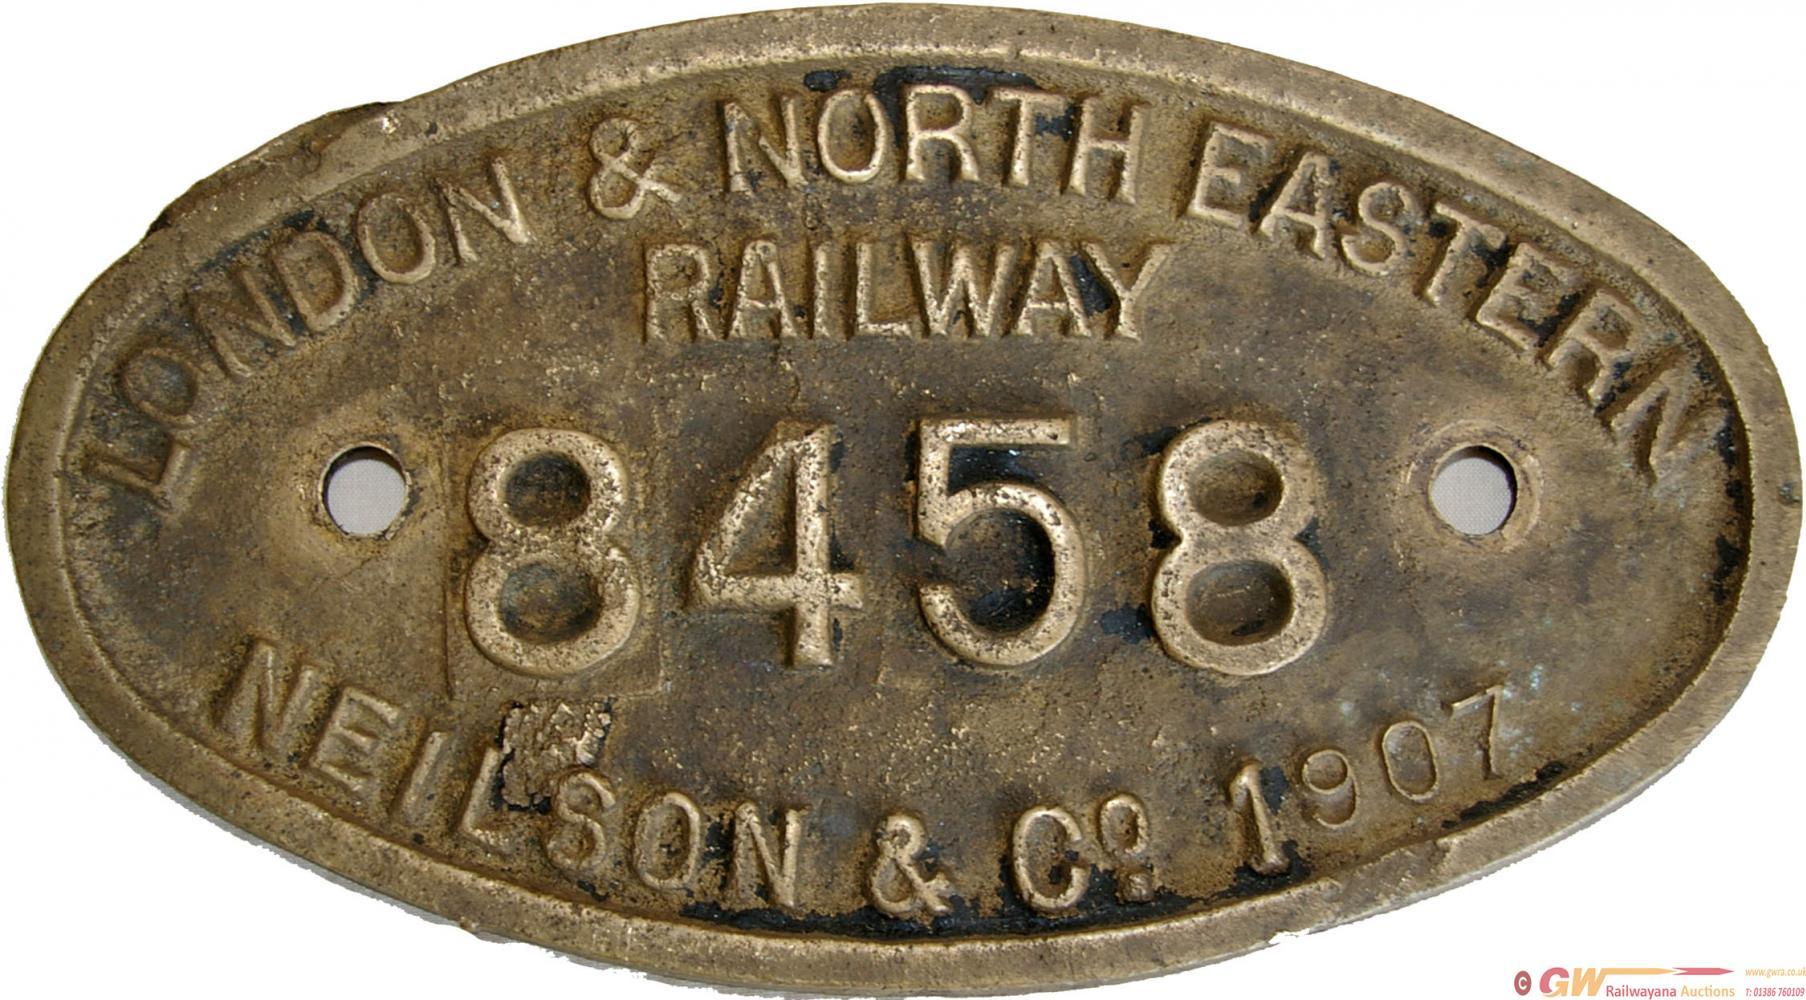 London & North Eastern Railway 9X5 Brass